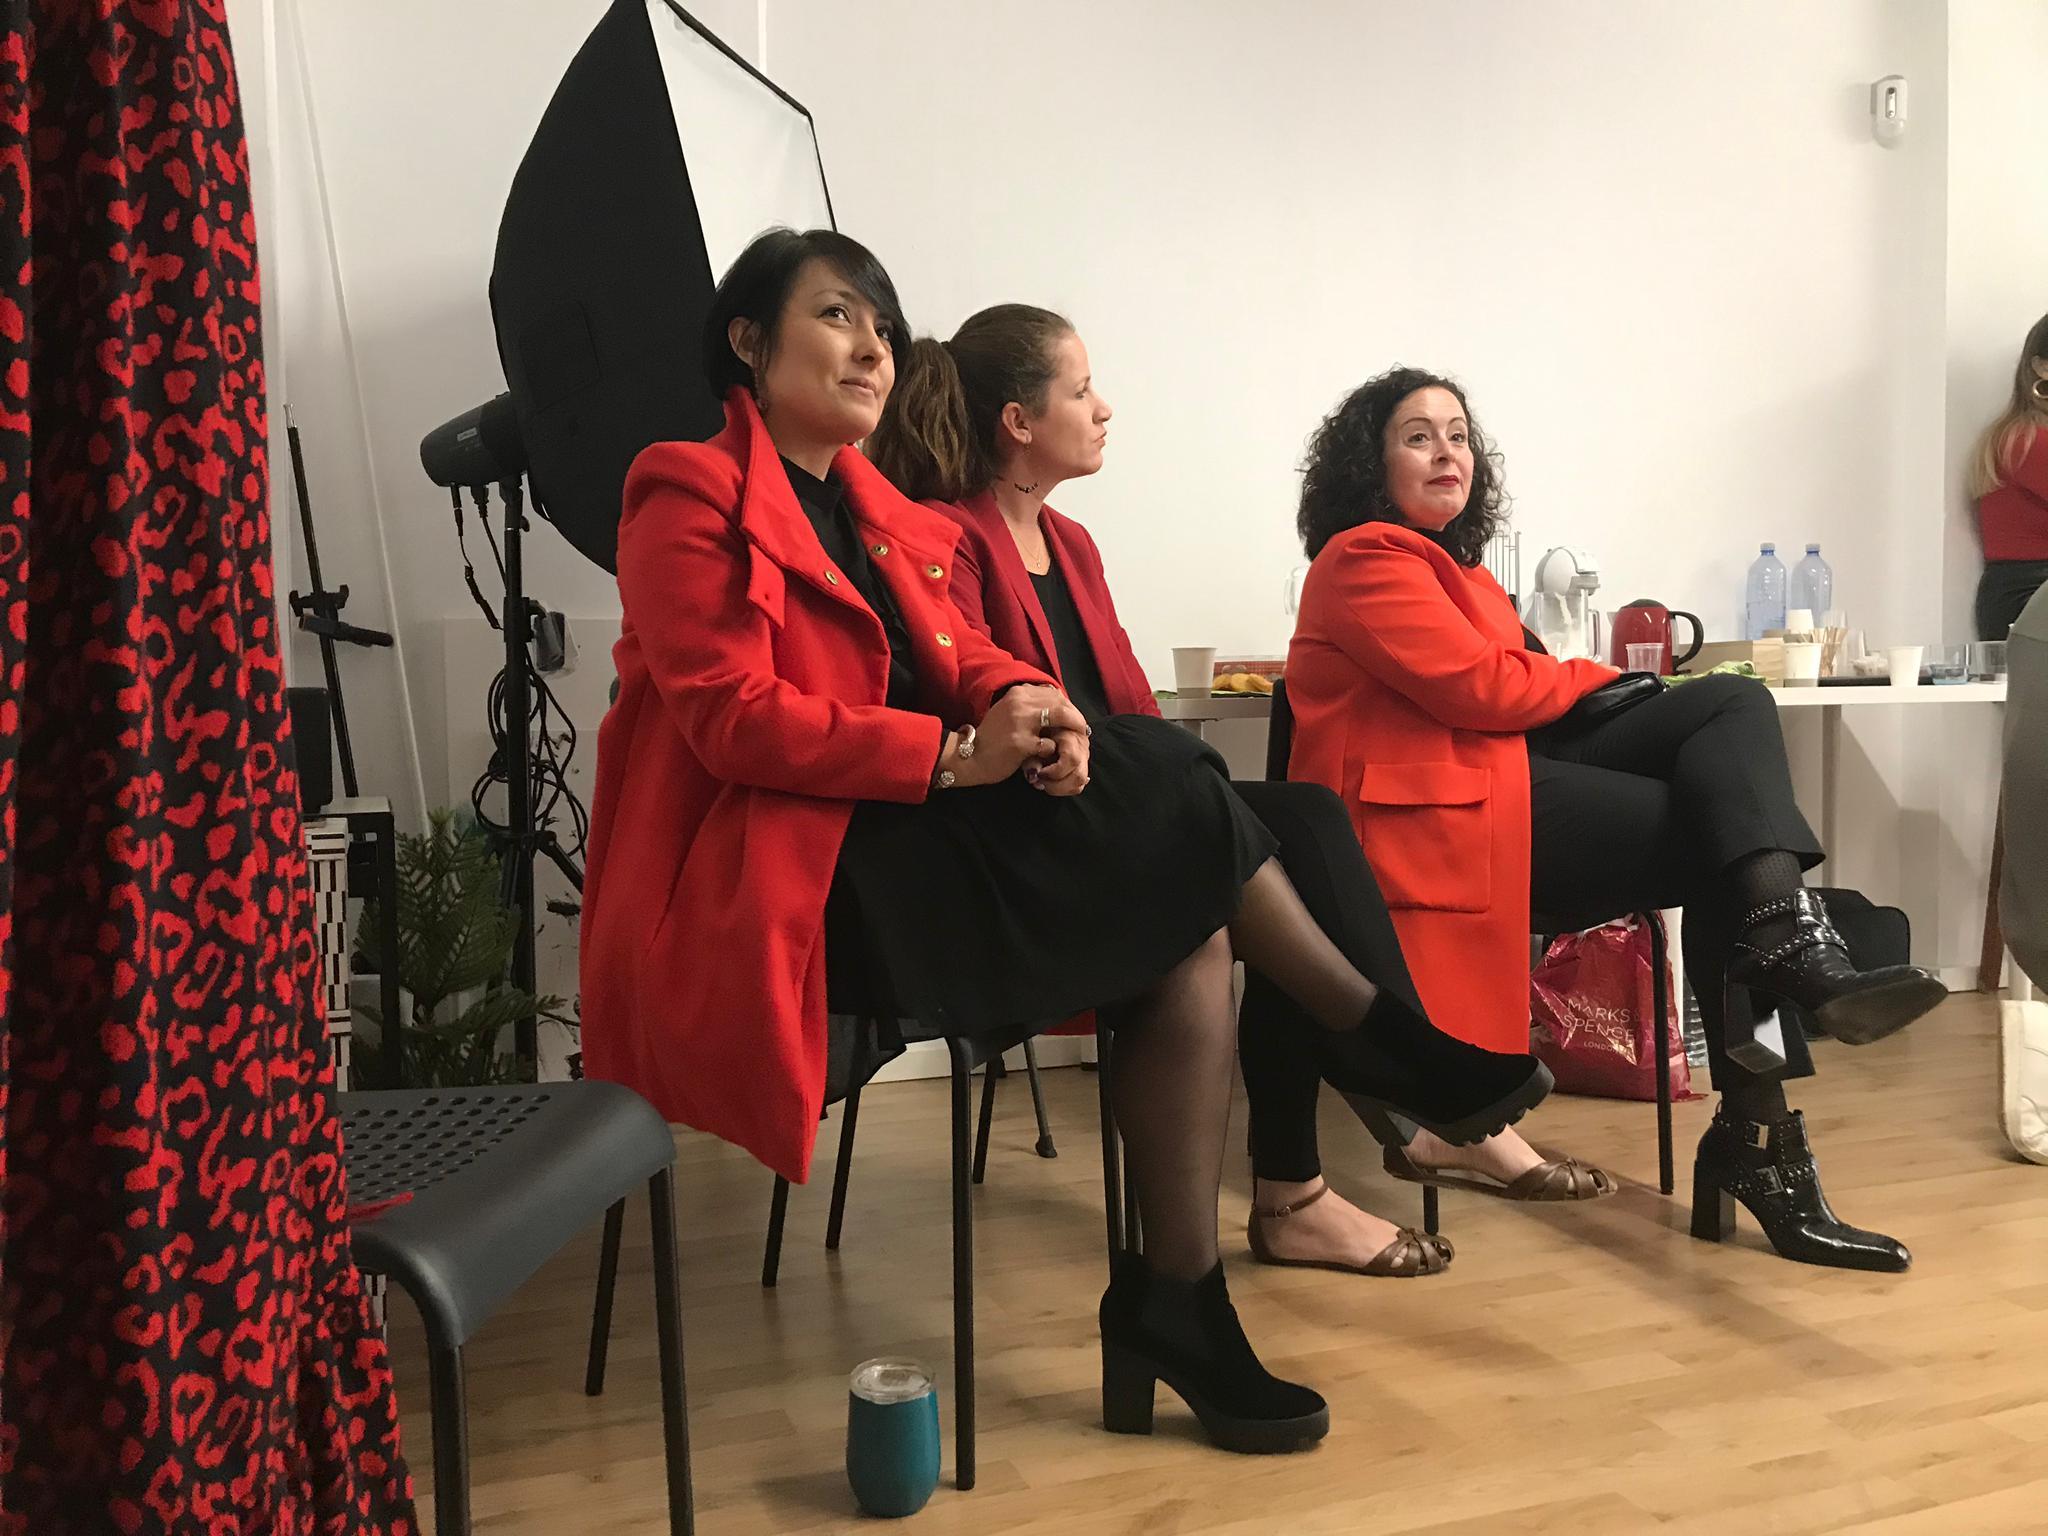 mujeres emprendedoras sentadas